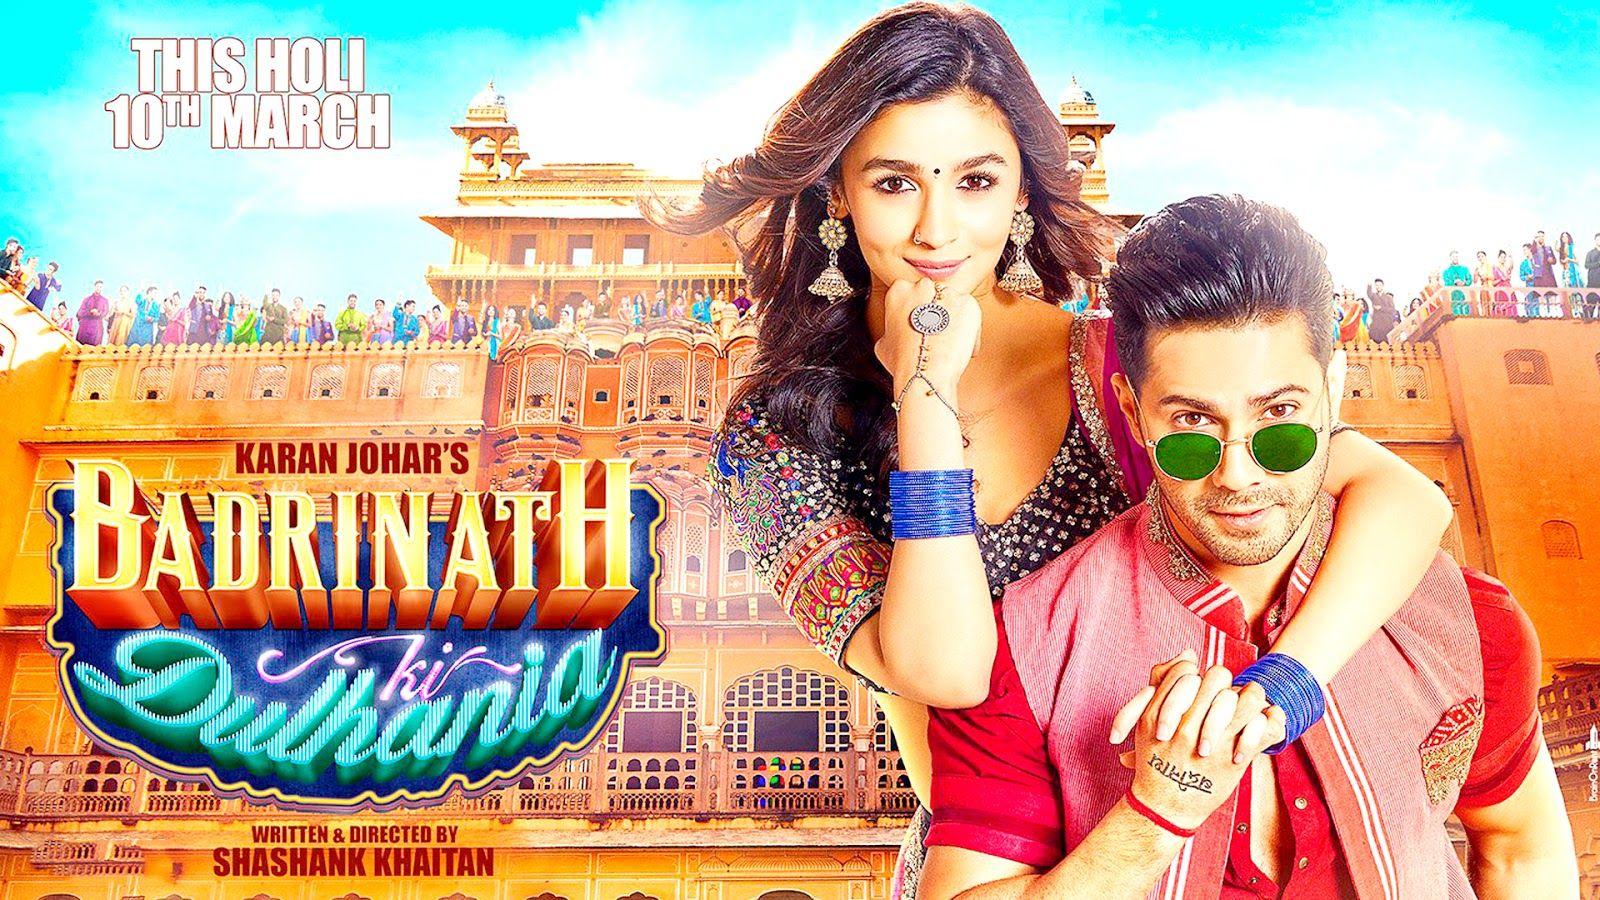 badrinath ki dulhania english subtitles full movie download